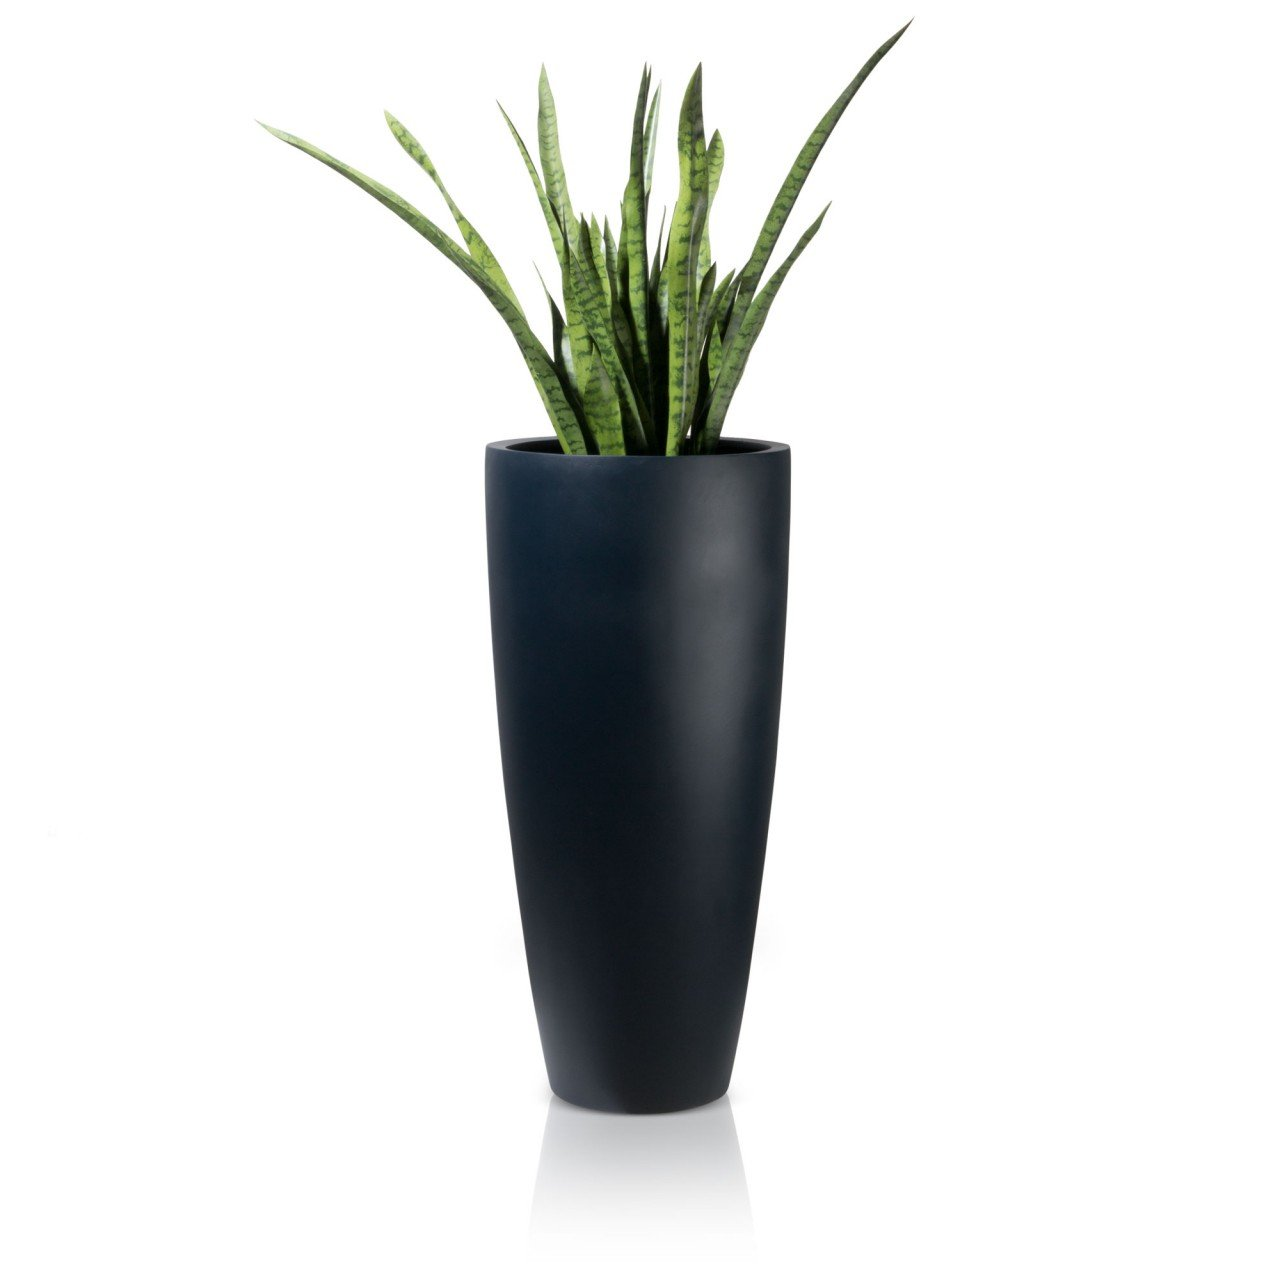 pflanzk bel blumenk bel puro 100 blumentopf fiberglas 47x47x100 cm farbe schwarz matt. Black Bedroom Furniture Sets. Home Design Ideas